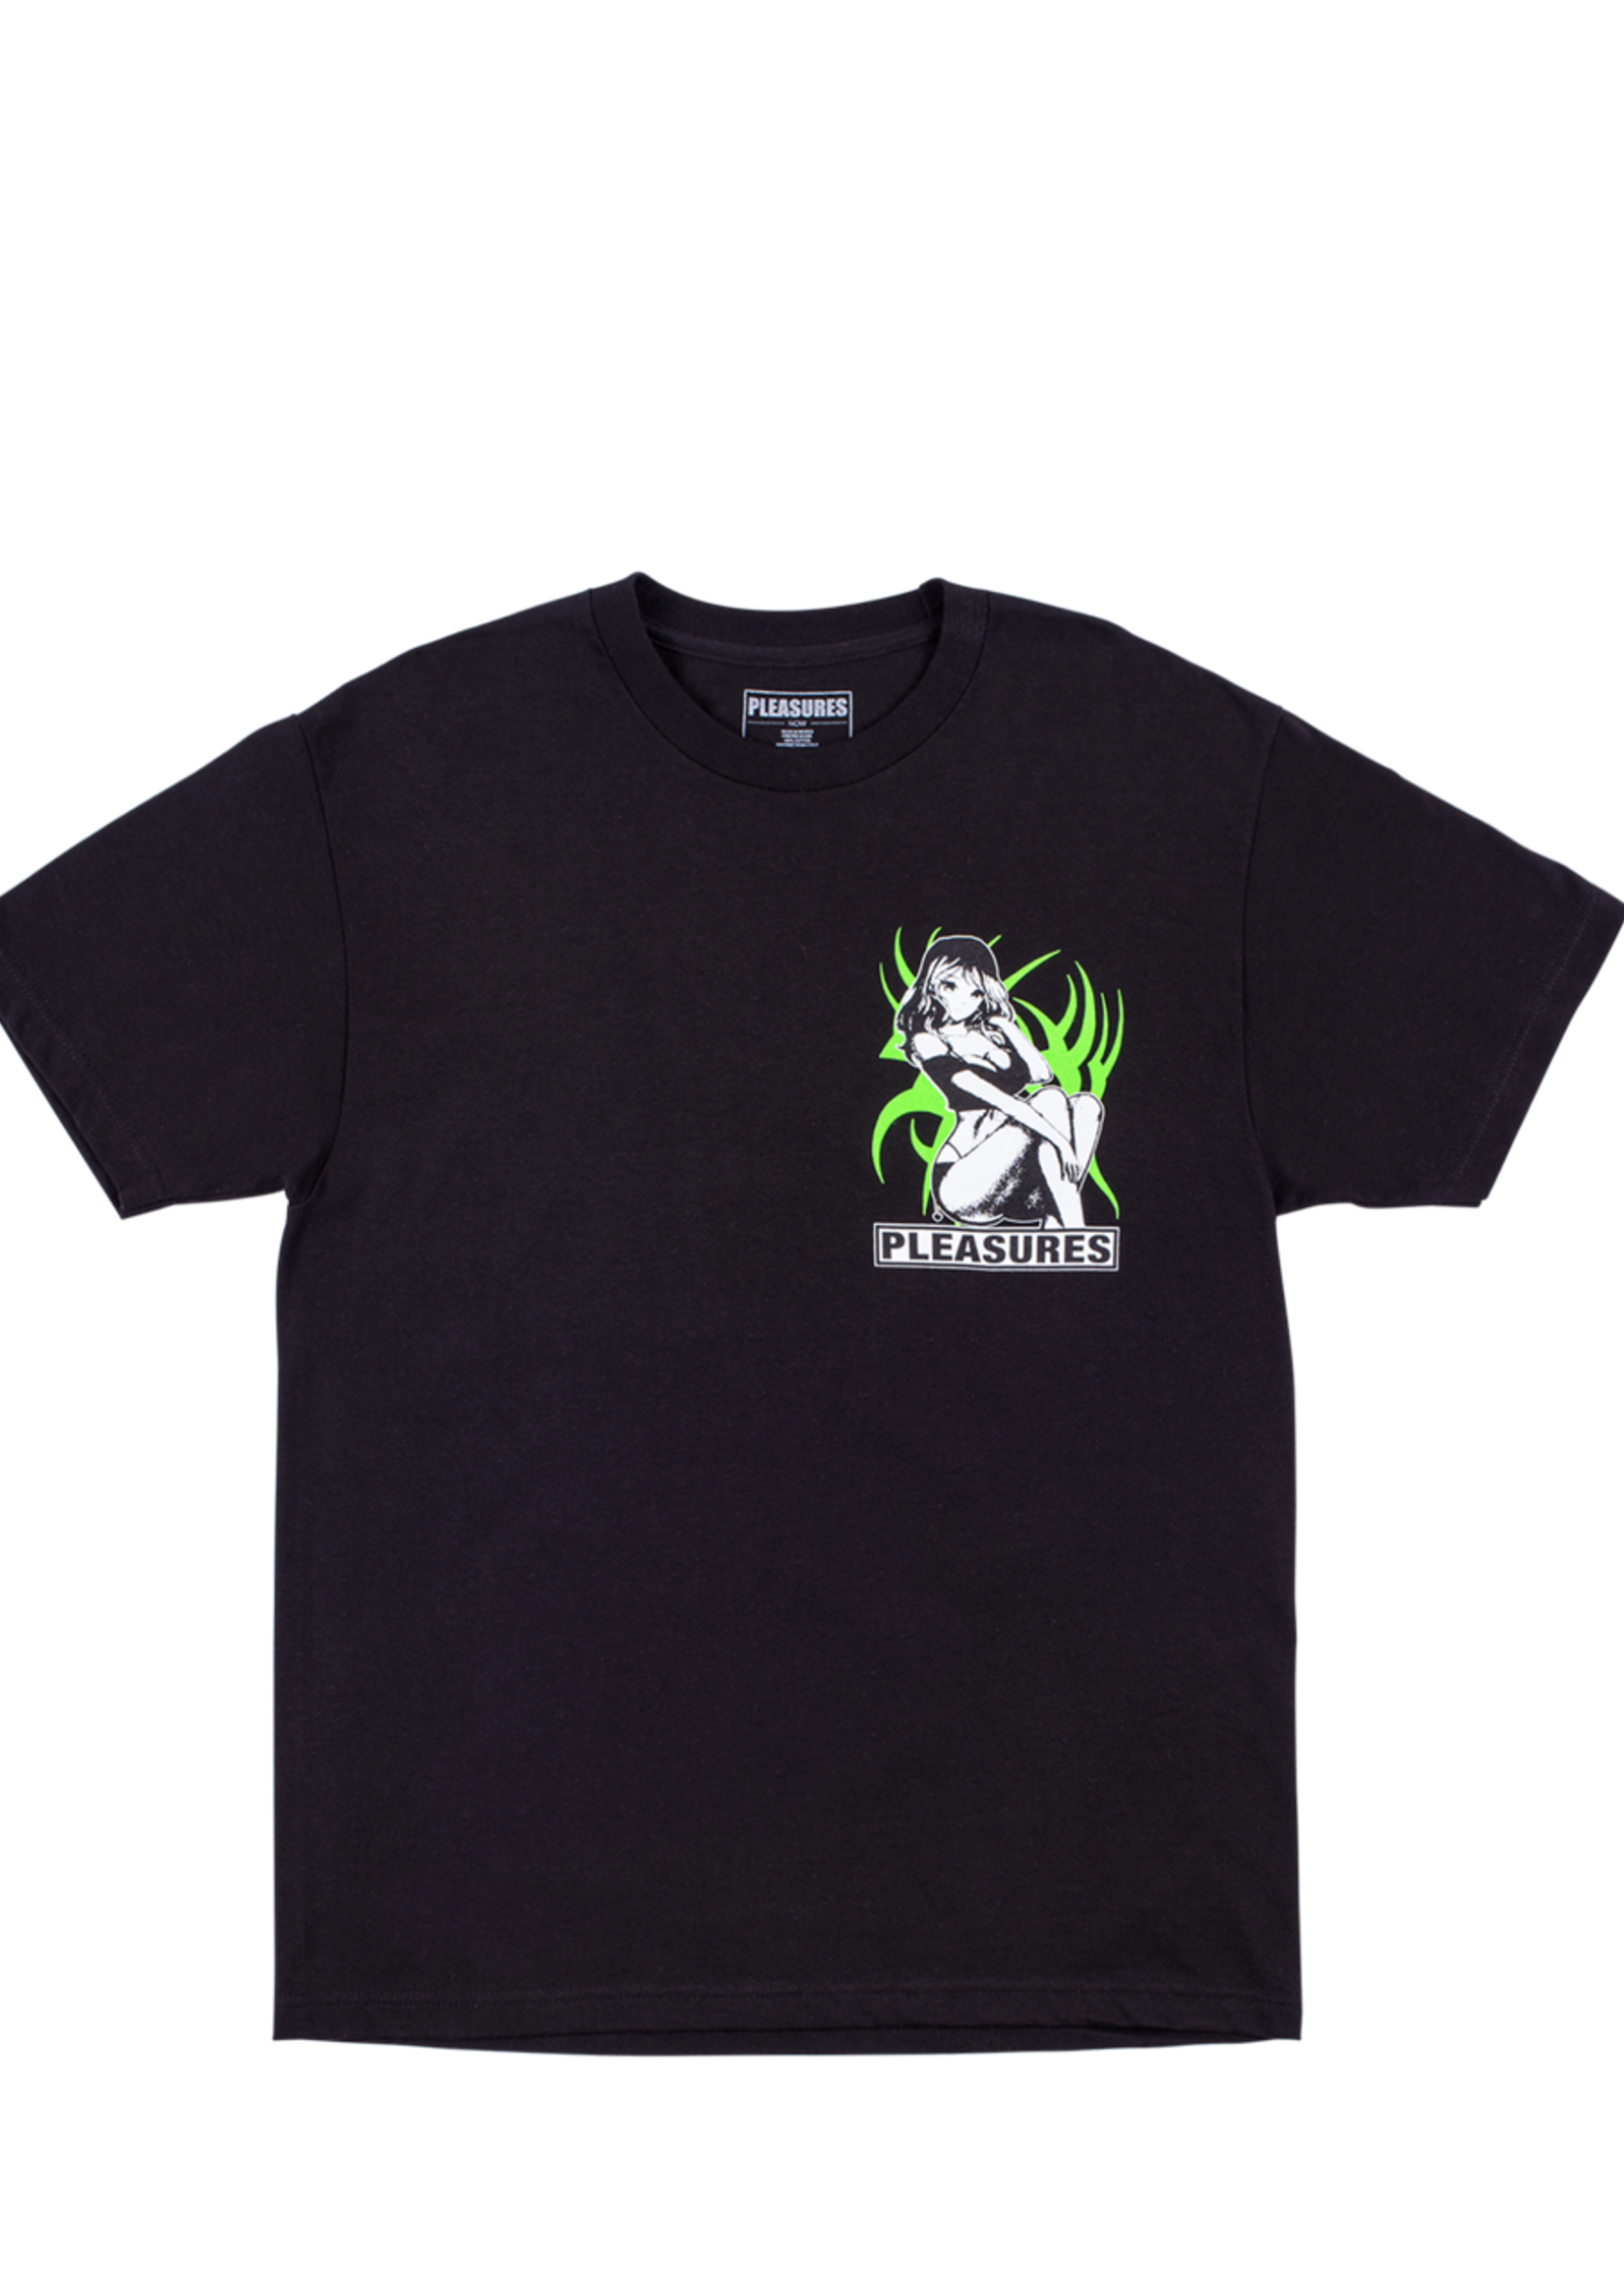 PLEASURES Bossy T-shirt in Black